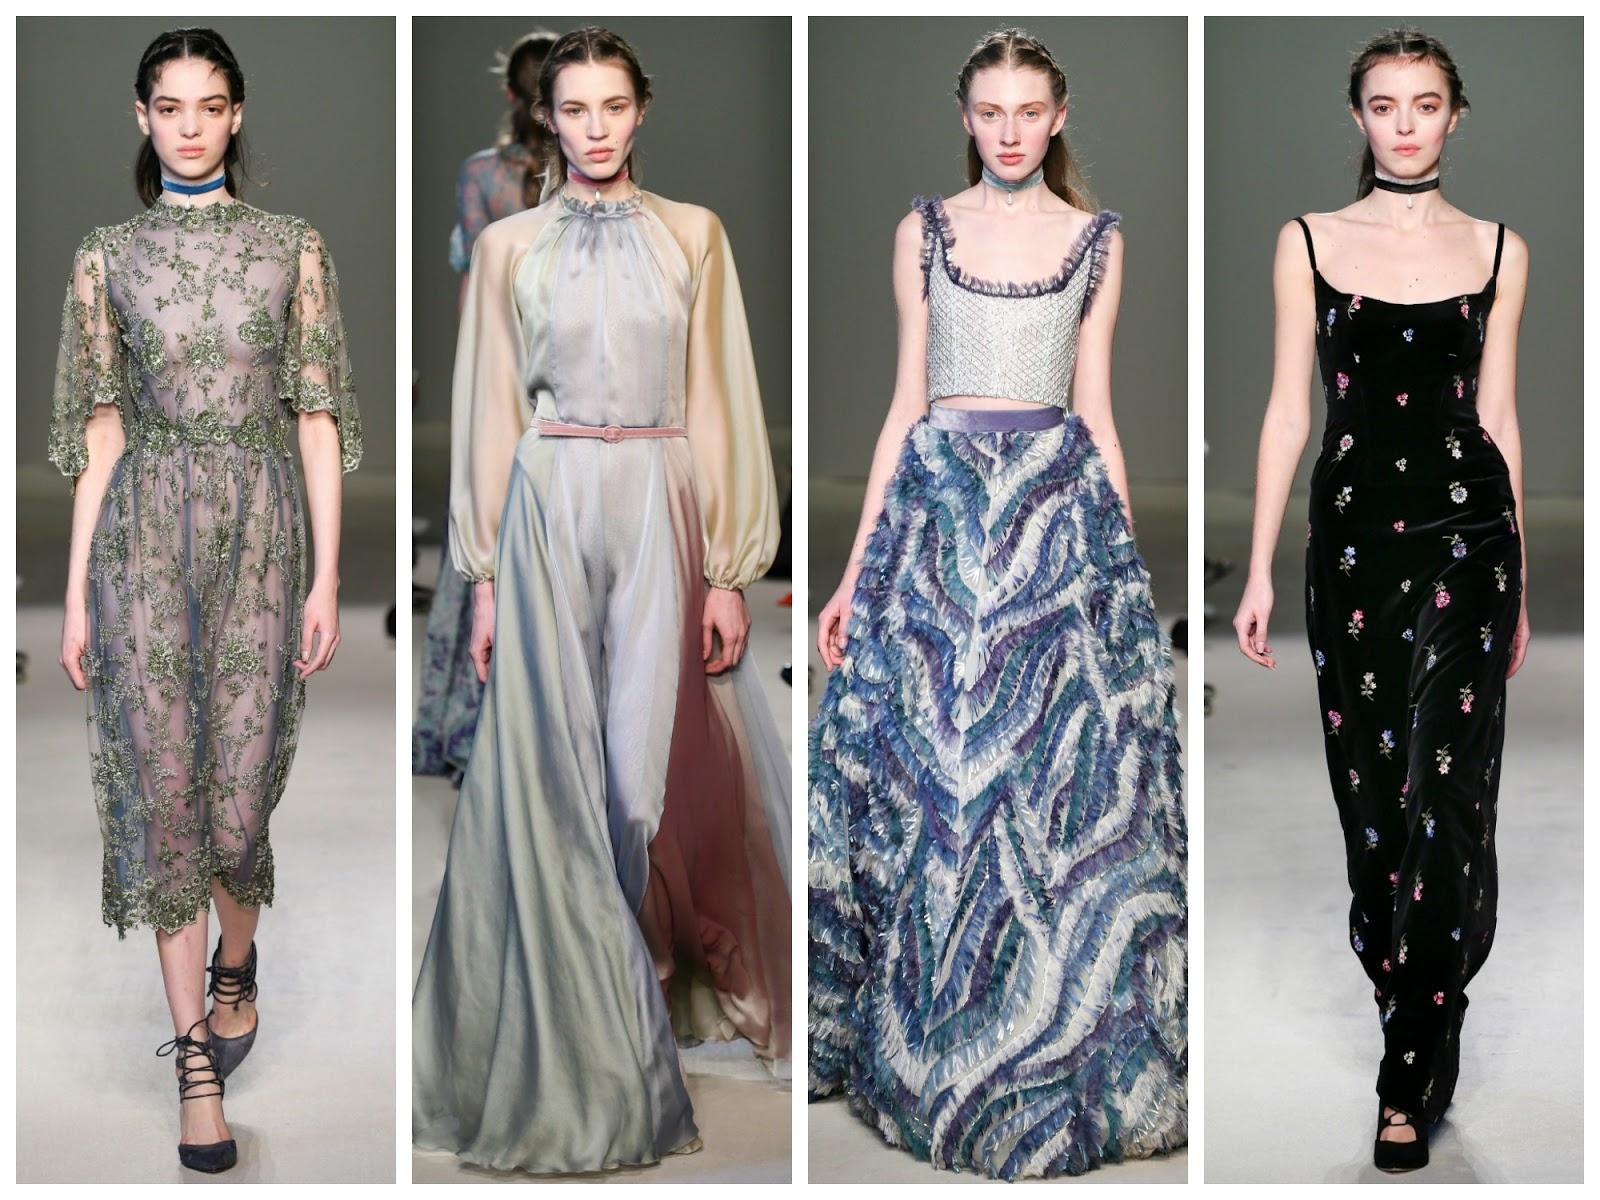 luisa-beccaria-fall-winter-2016-fashion-show-collection-milan